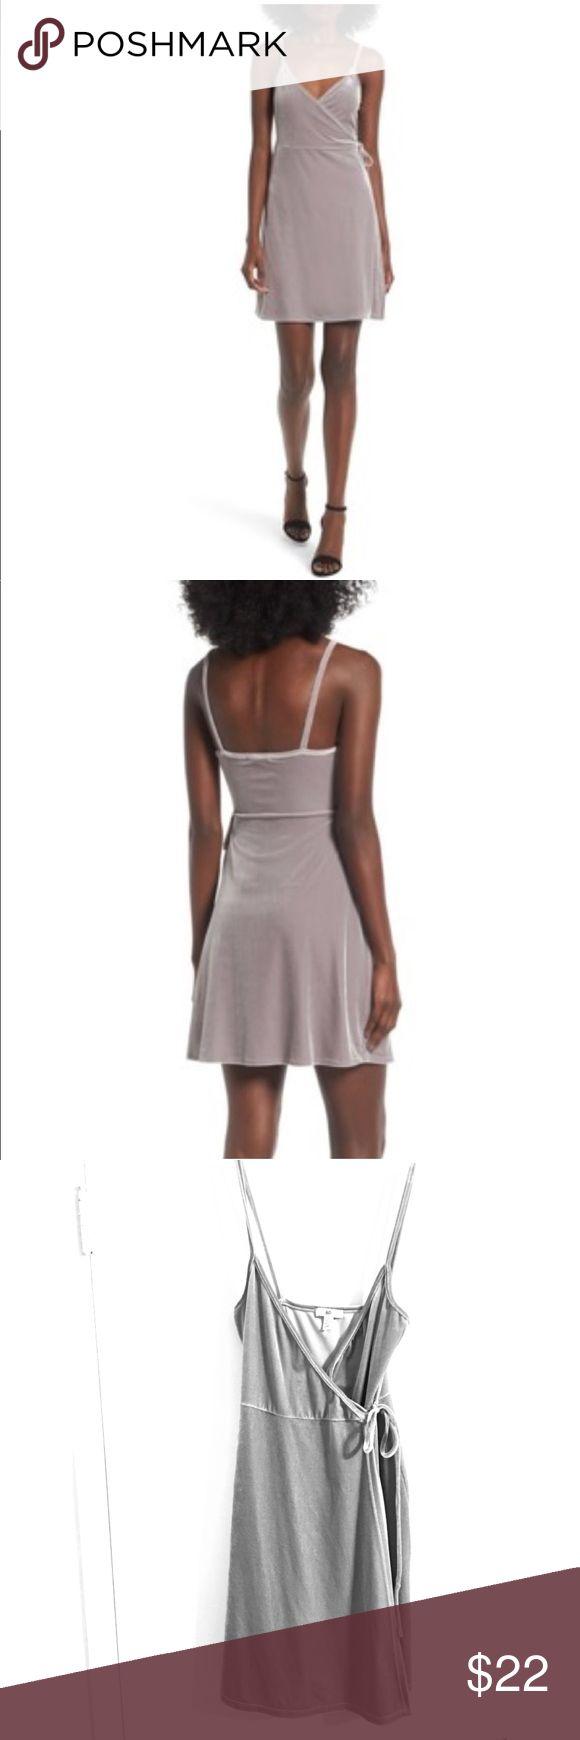 🎀 BP Velvet Wrap Dress Worn for a few hours, great condition! bp Dresses Mini